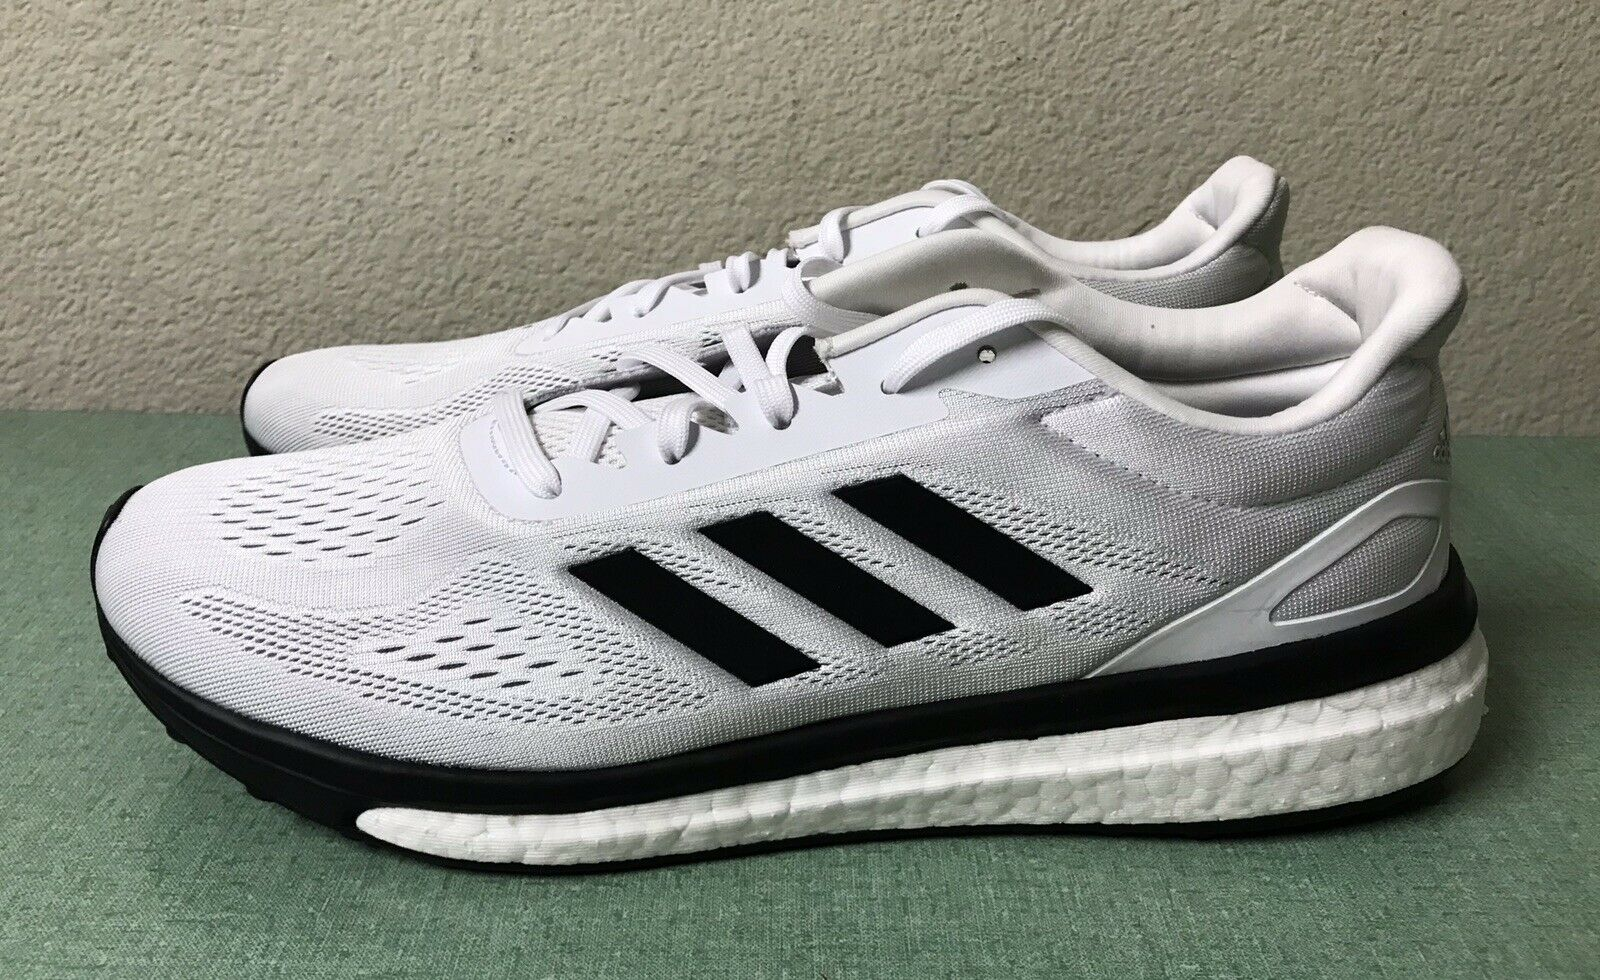 Adidas Response Boost Lt blancoo Negro para Hombre Talla 10.5 Calzado para Correr BA7543 Ultra Nuevo